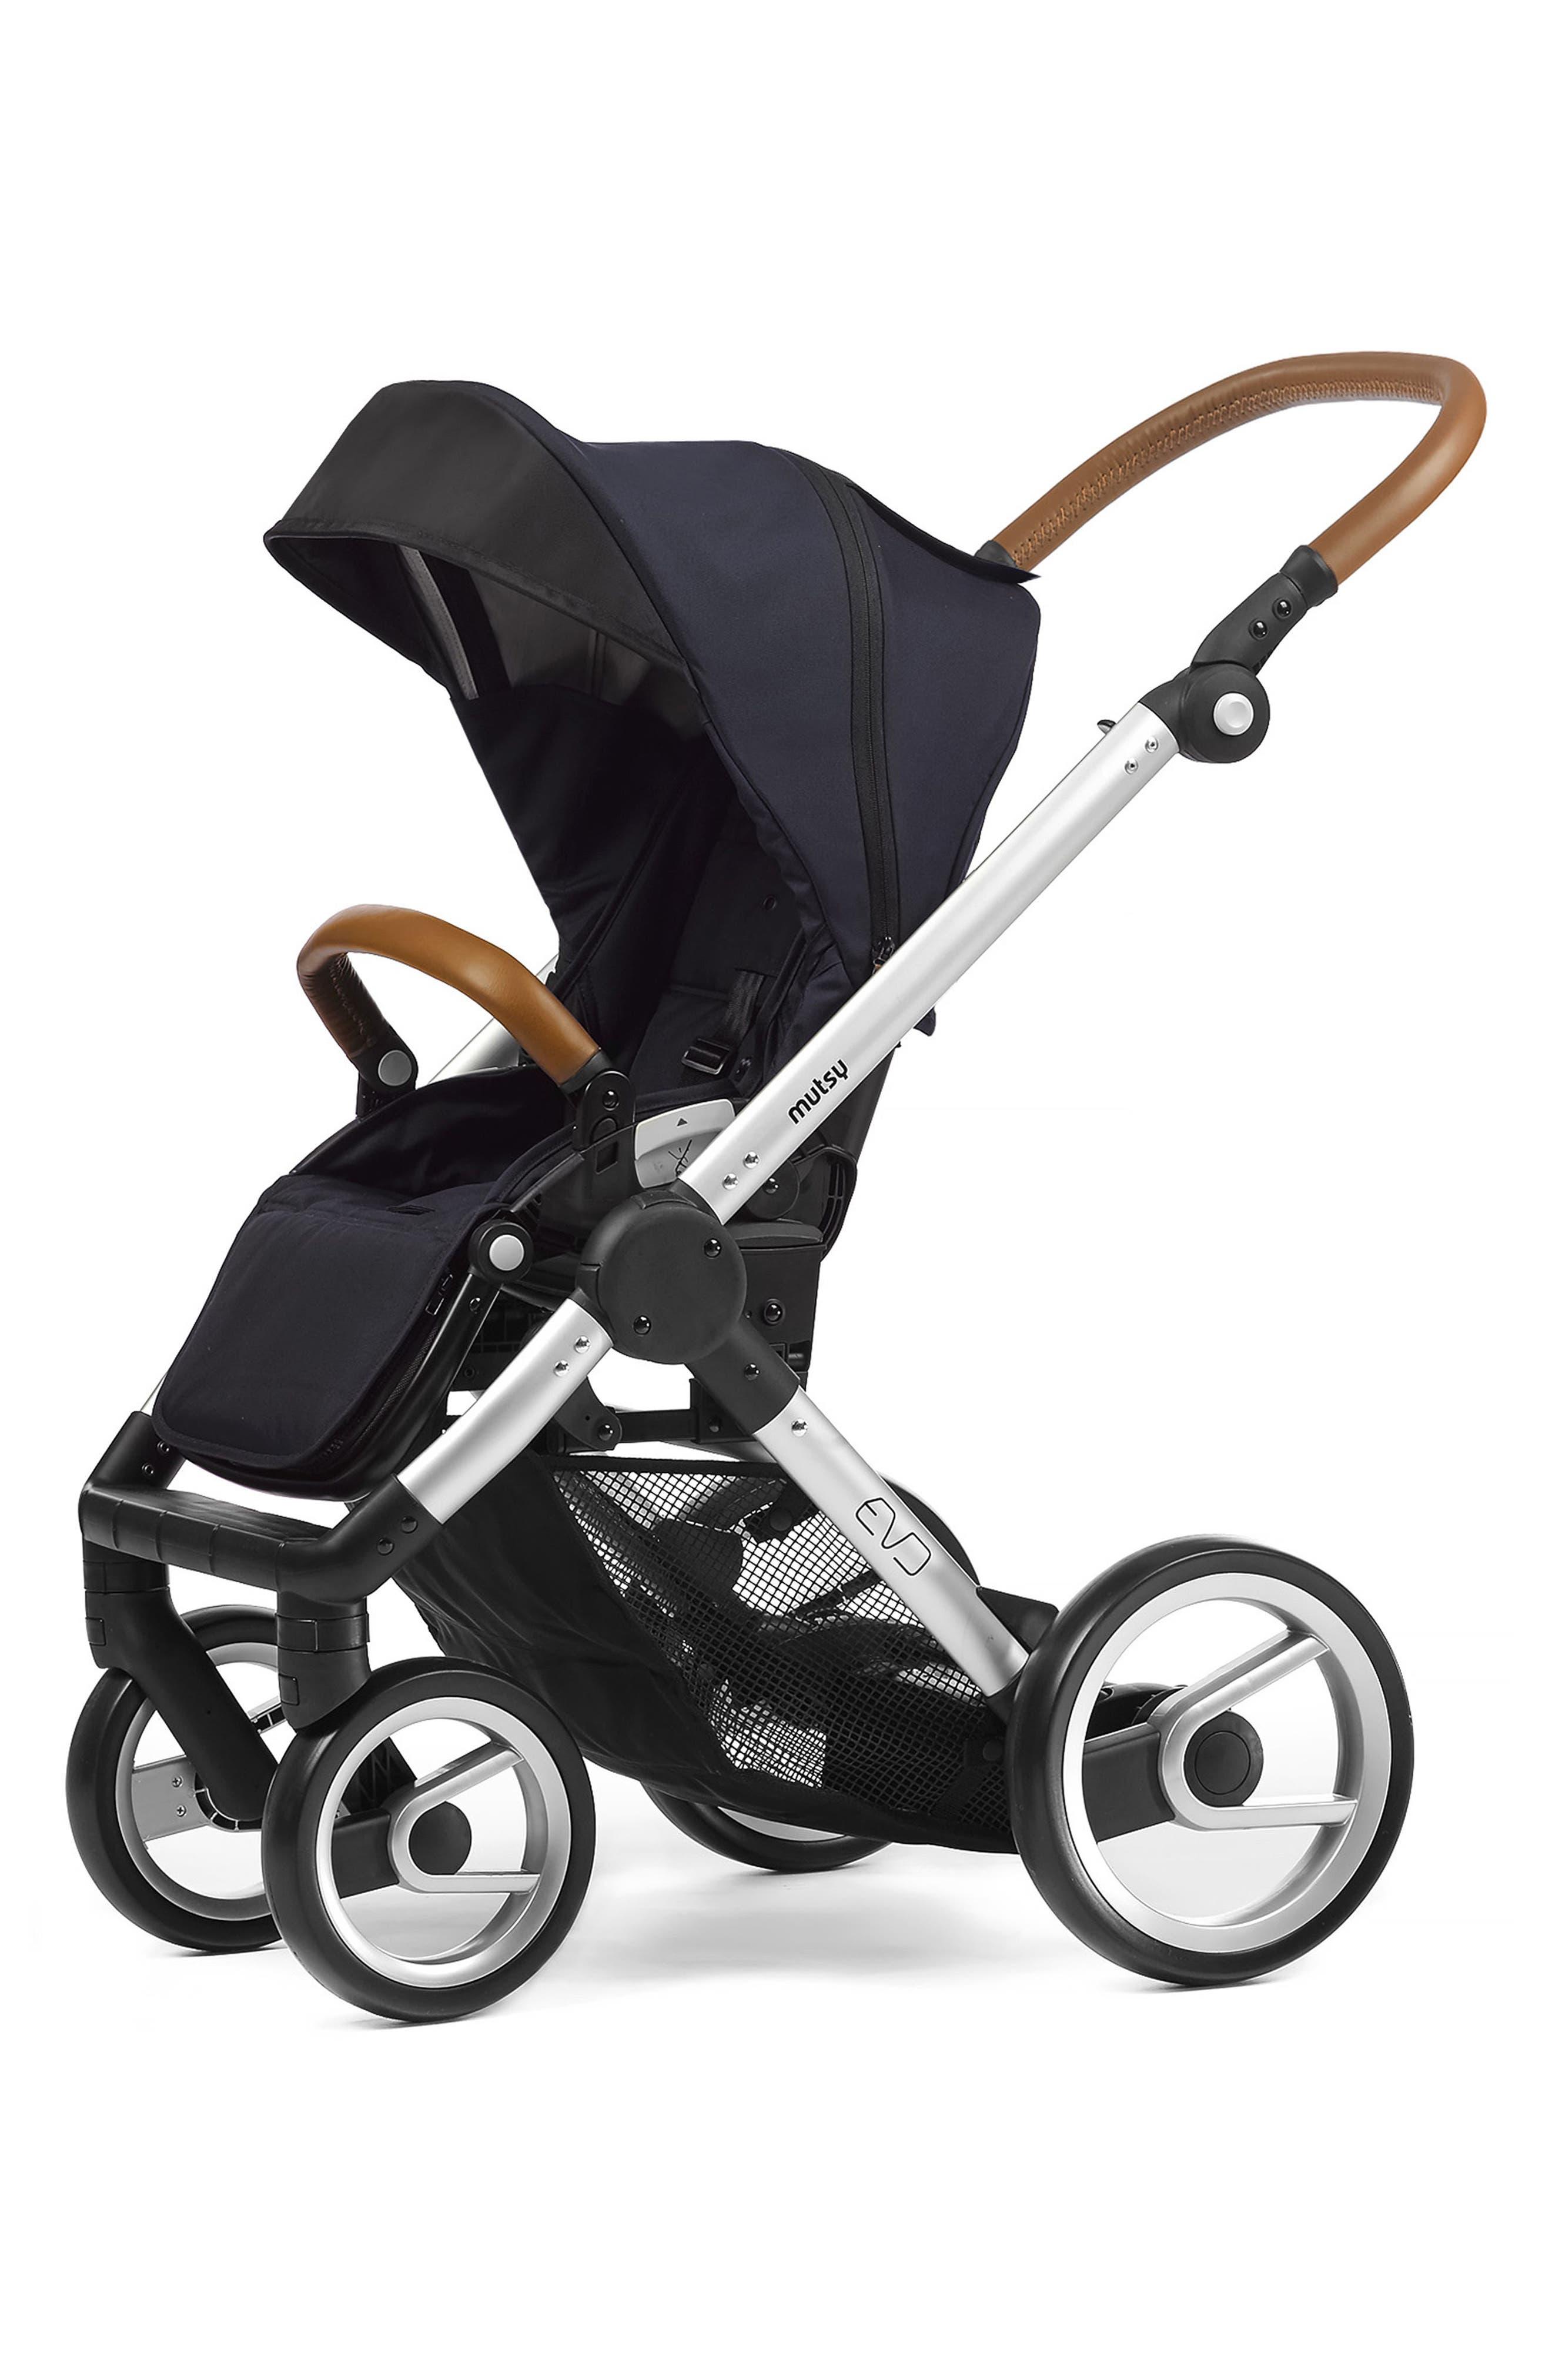 Evo - Urban Nomad Stroller,                             Main thumbnail 1, color,                             040